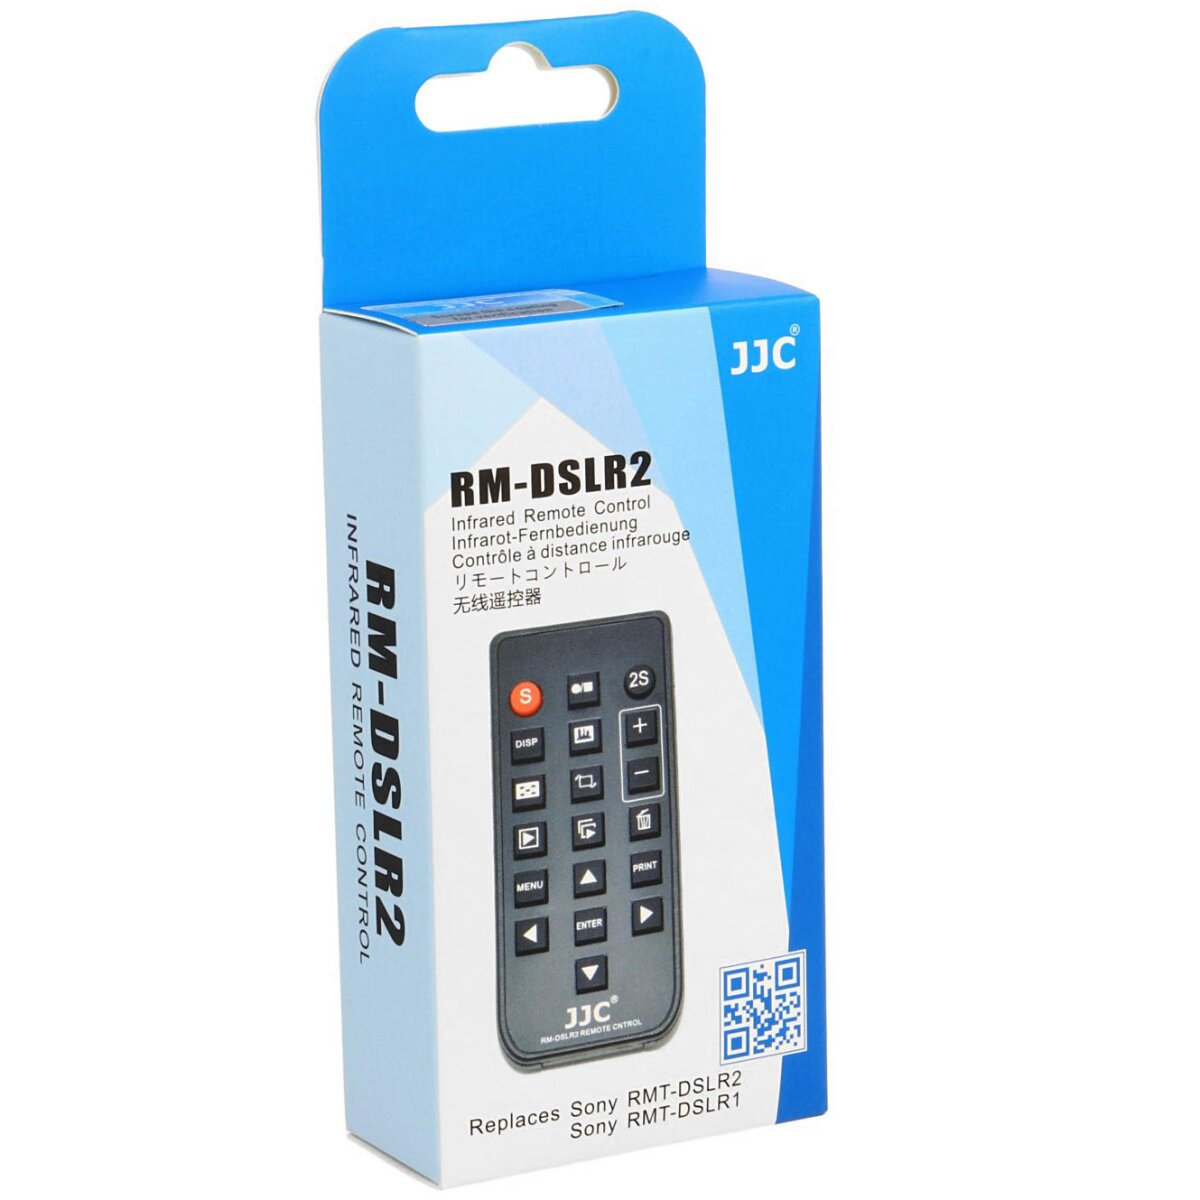 Infrarot Fernbedienung JJC RM-DSLR2 kompatibel mit Sony NEX